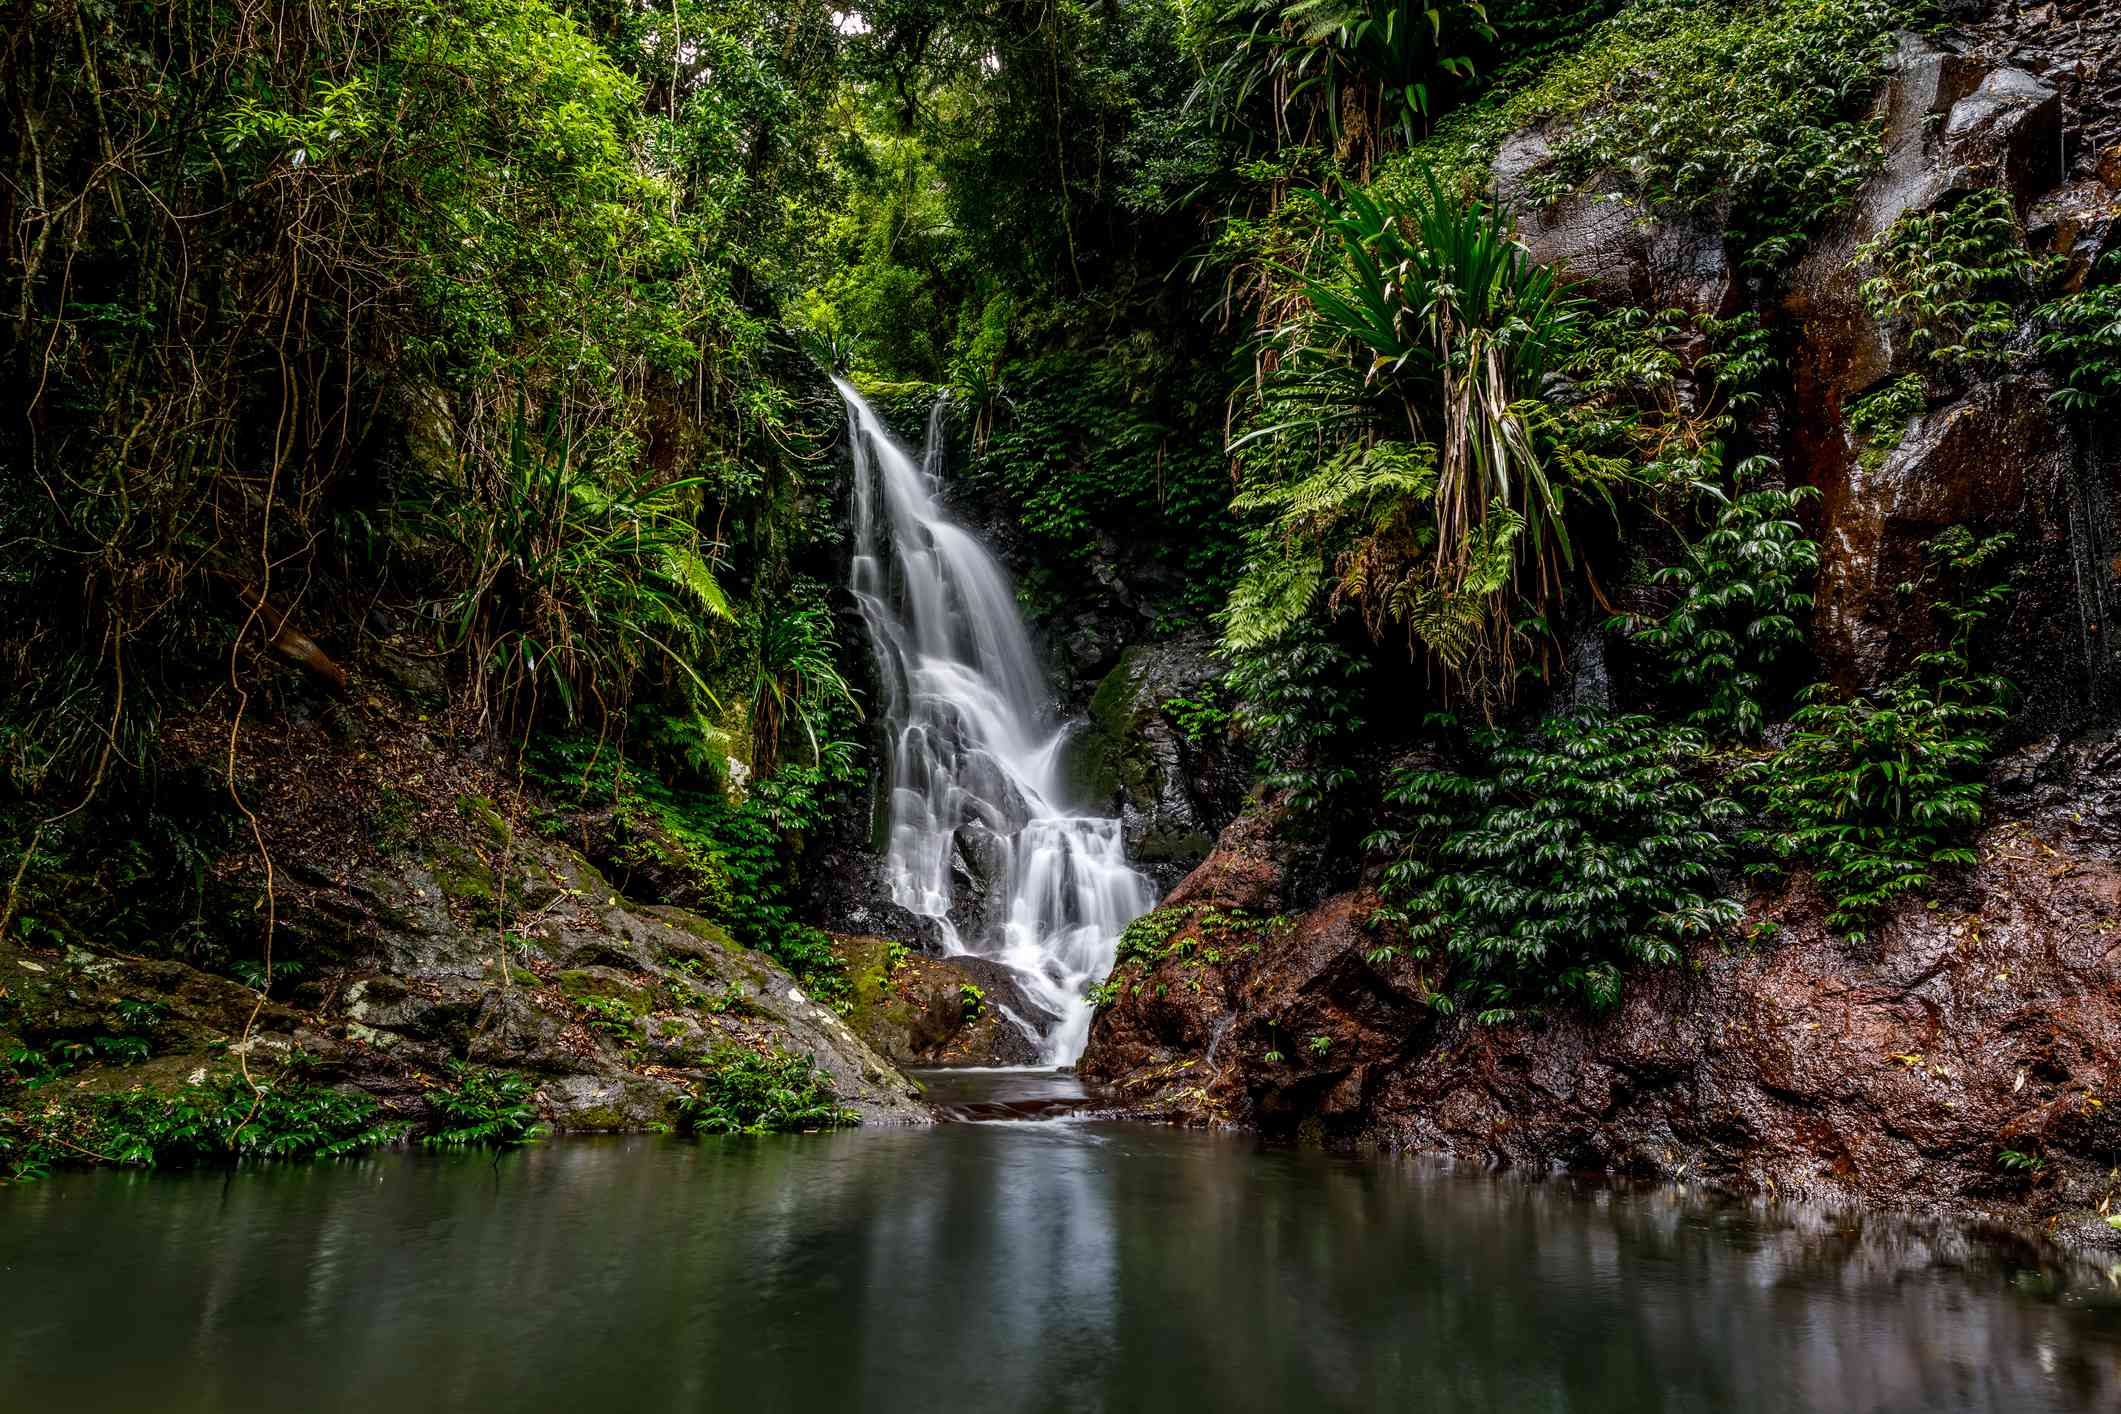 Elabana Falls in Lamington National Park